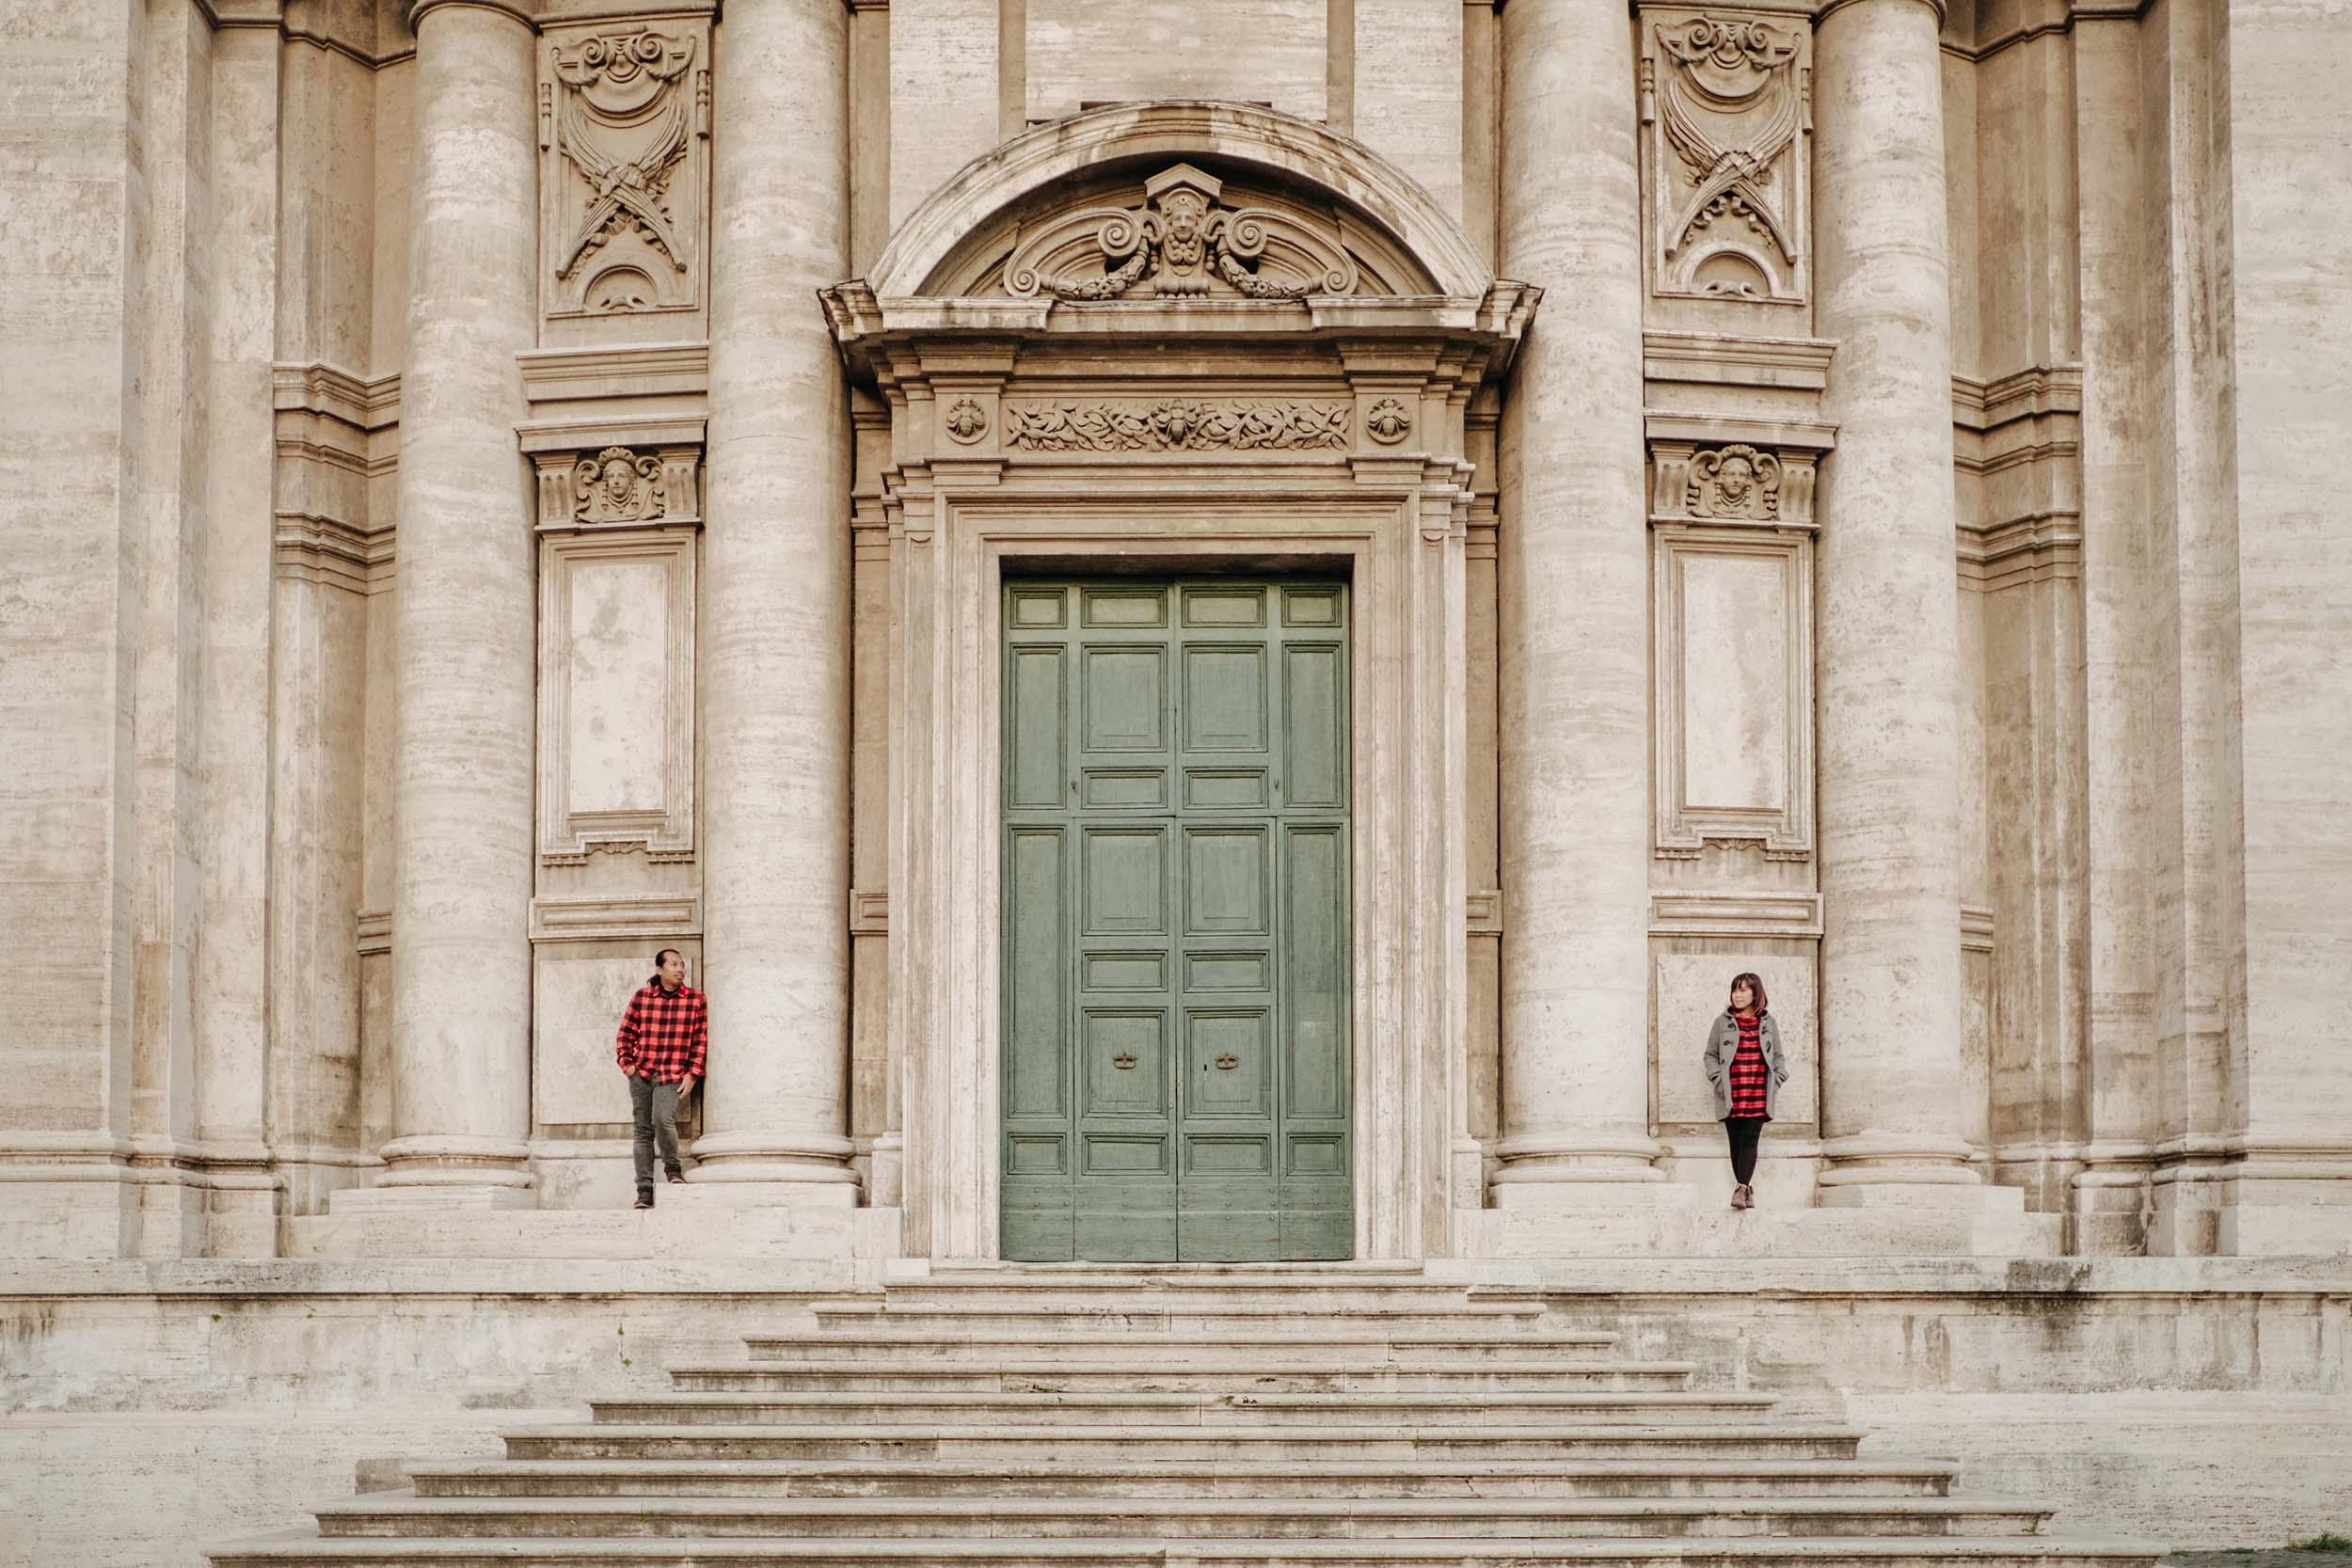 Flytographer Roberta in Rome